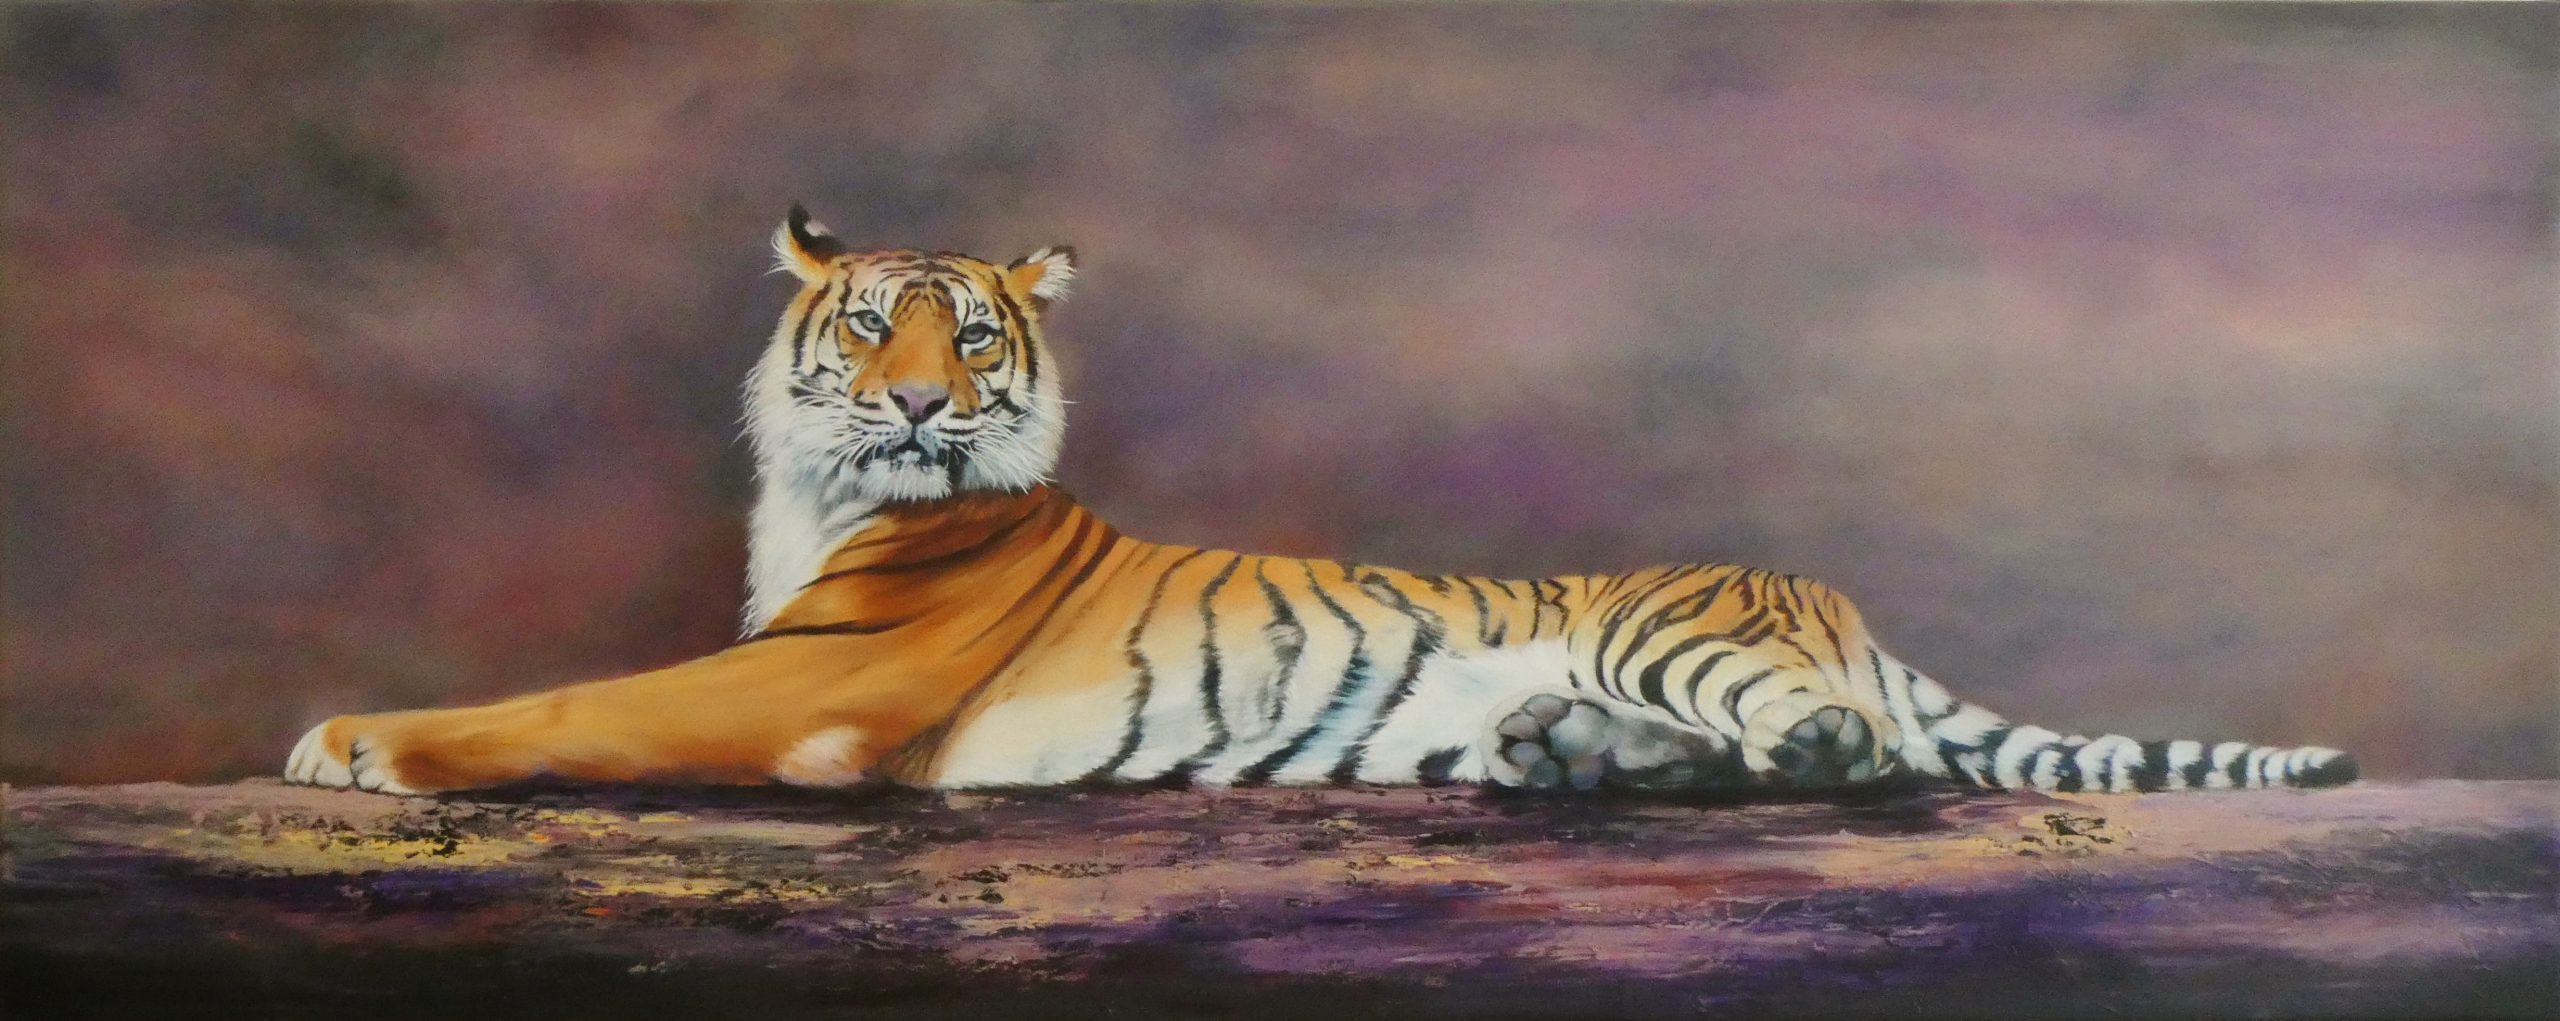 Clare Riddington Jones, Regal Feline, Water Based Oils On Canvas, 150cm X 60cm